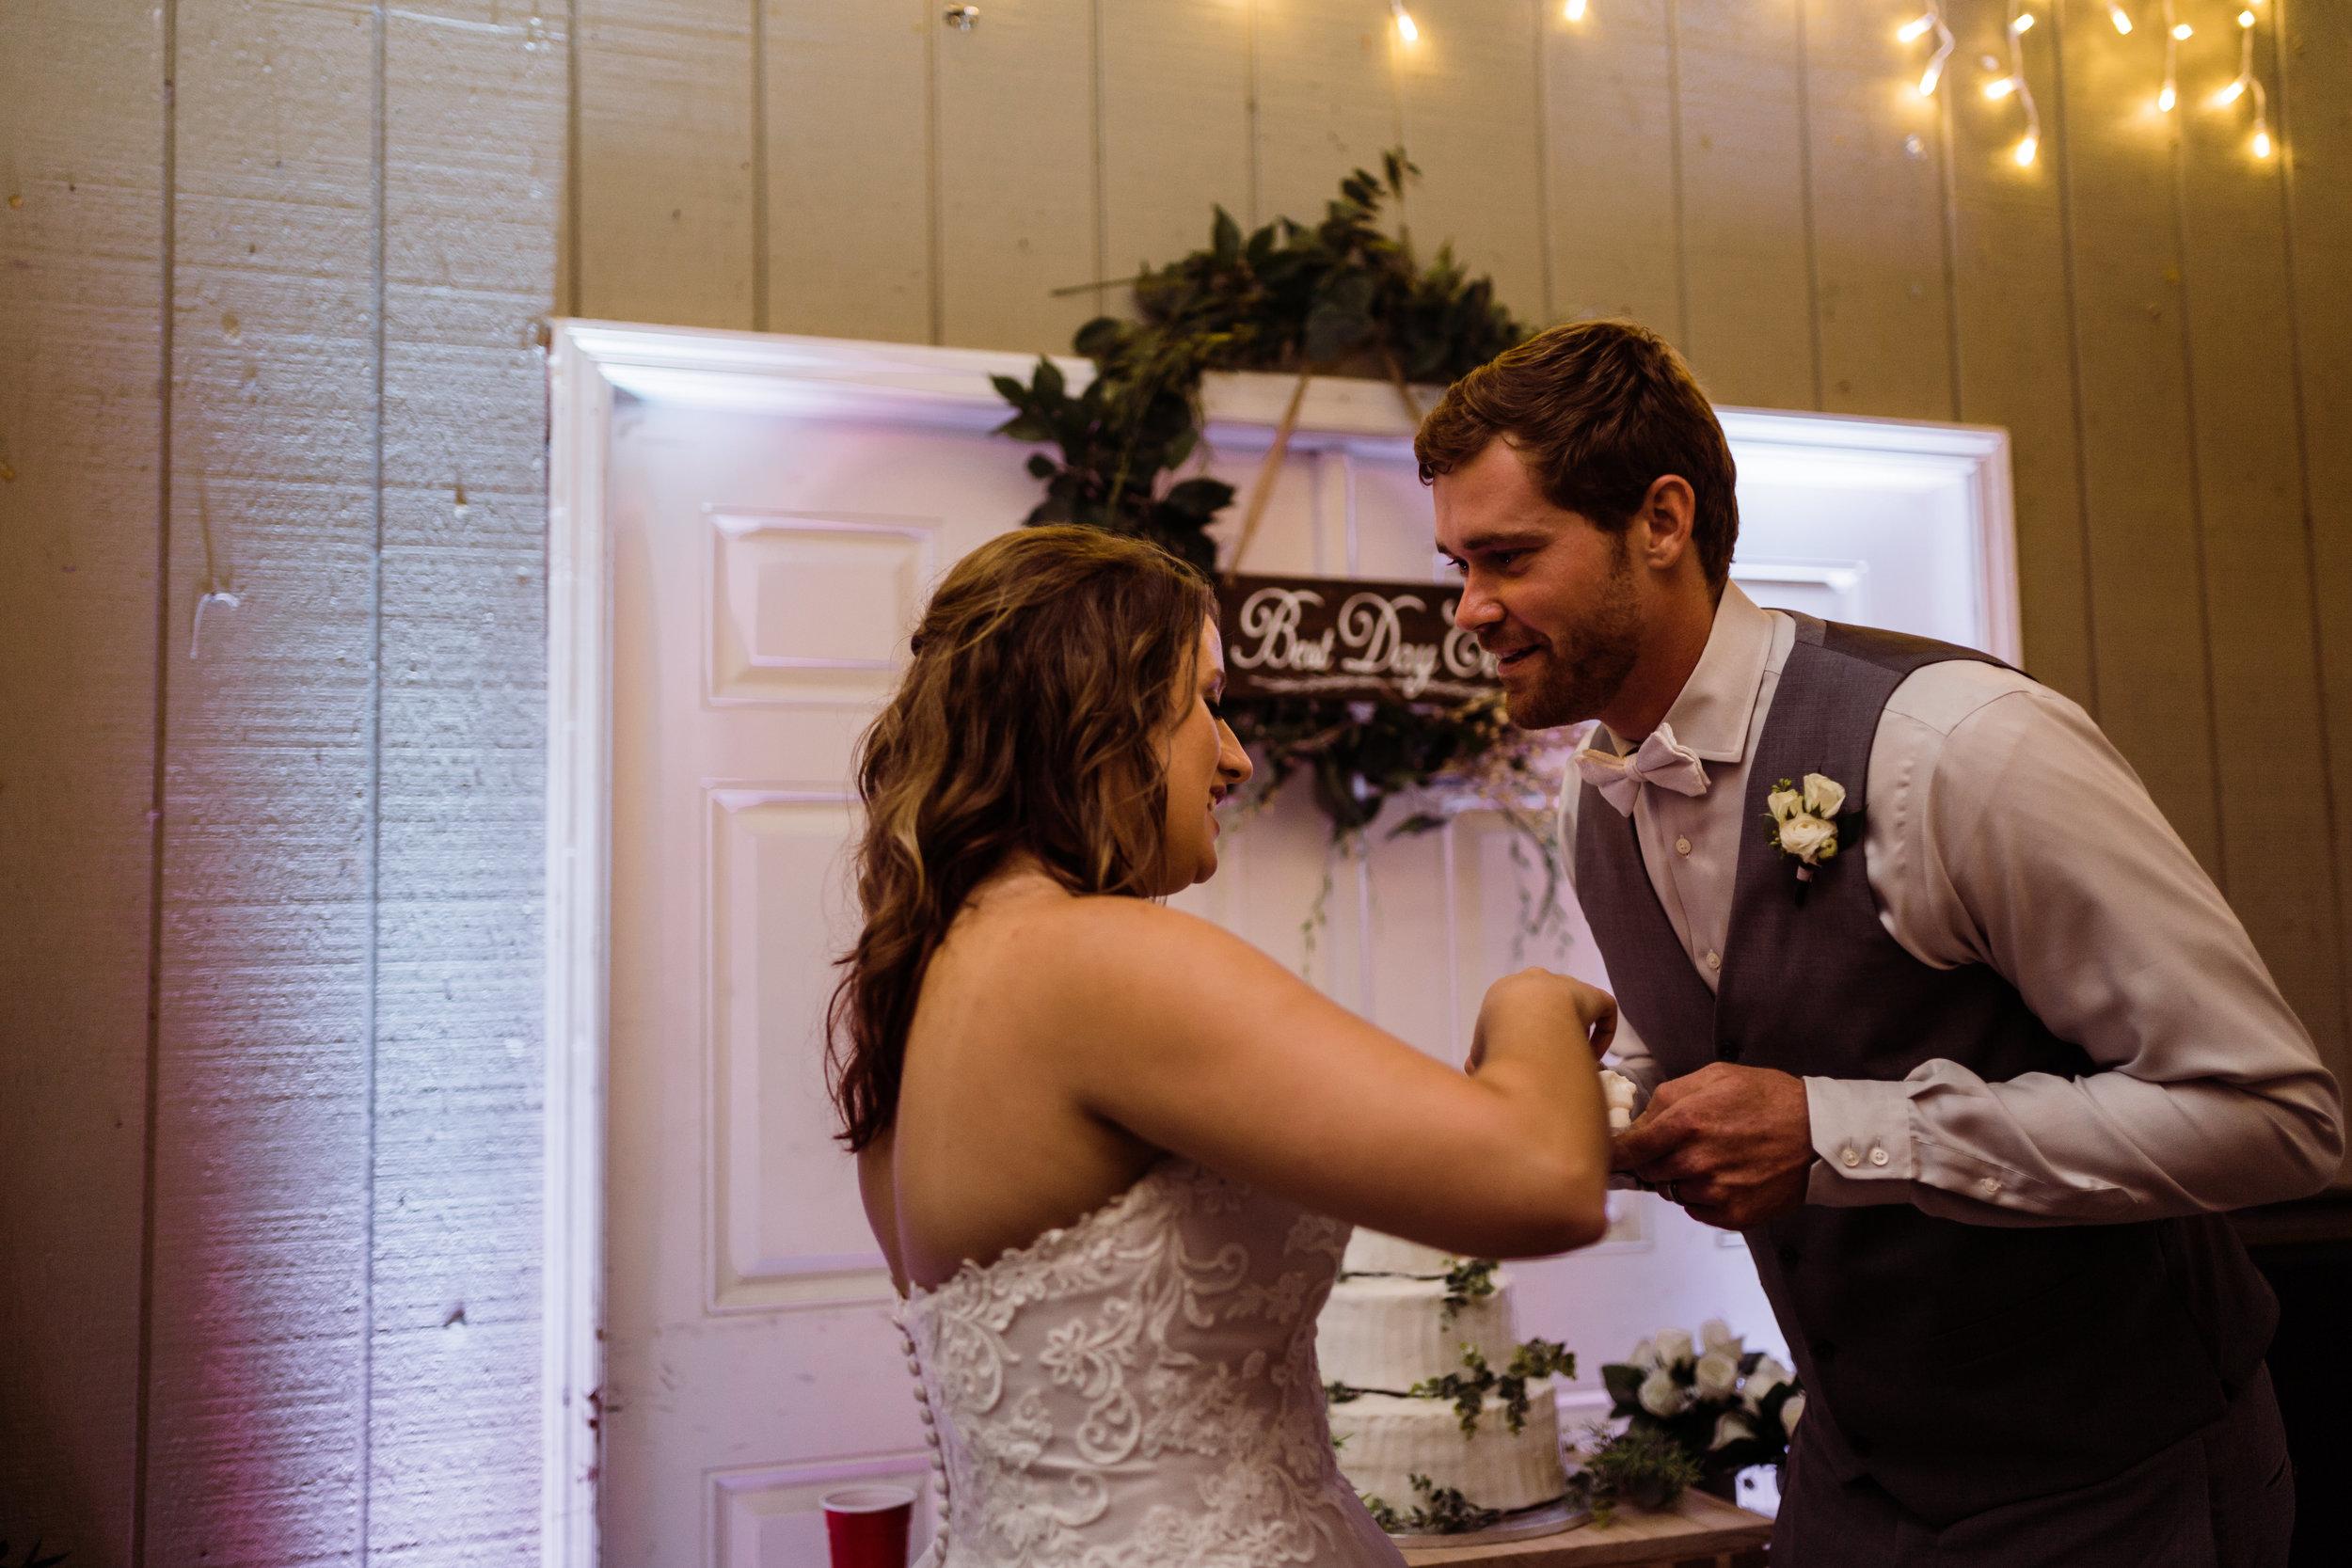 2017.10.14 Samantha and Matthew Crabtree Sarasota Wedding (546 of 708).jpg